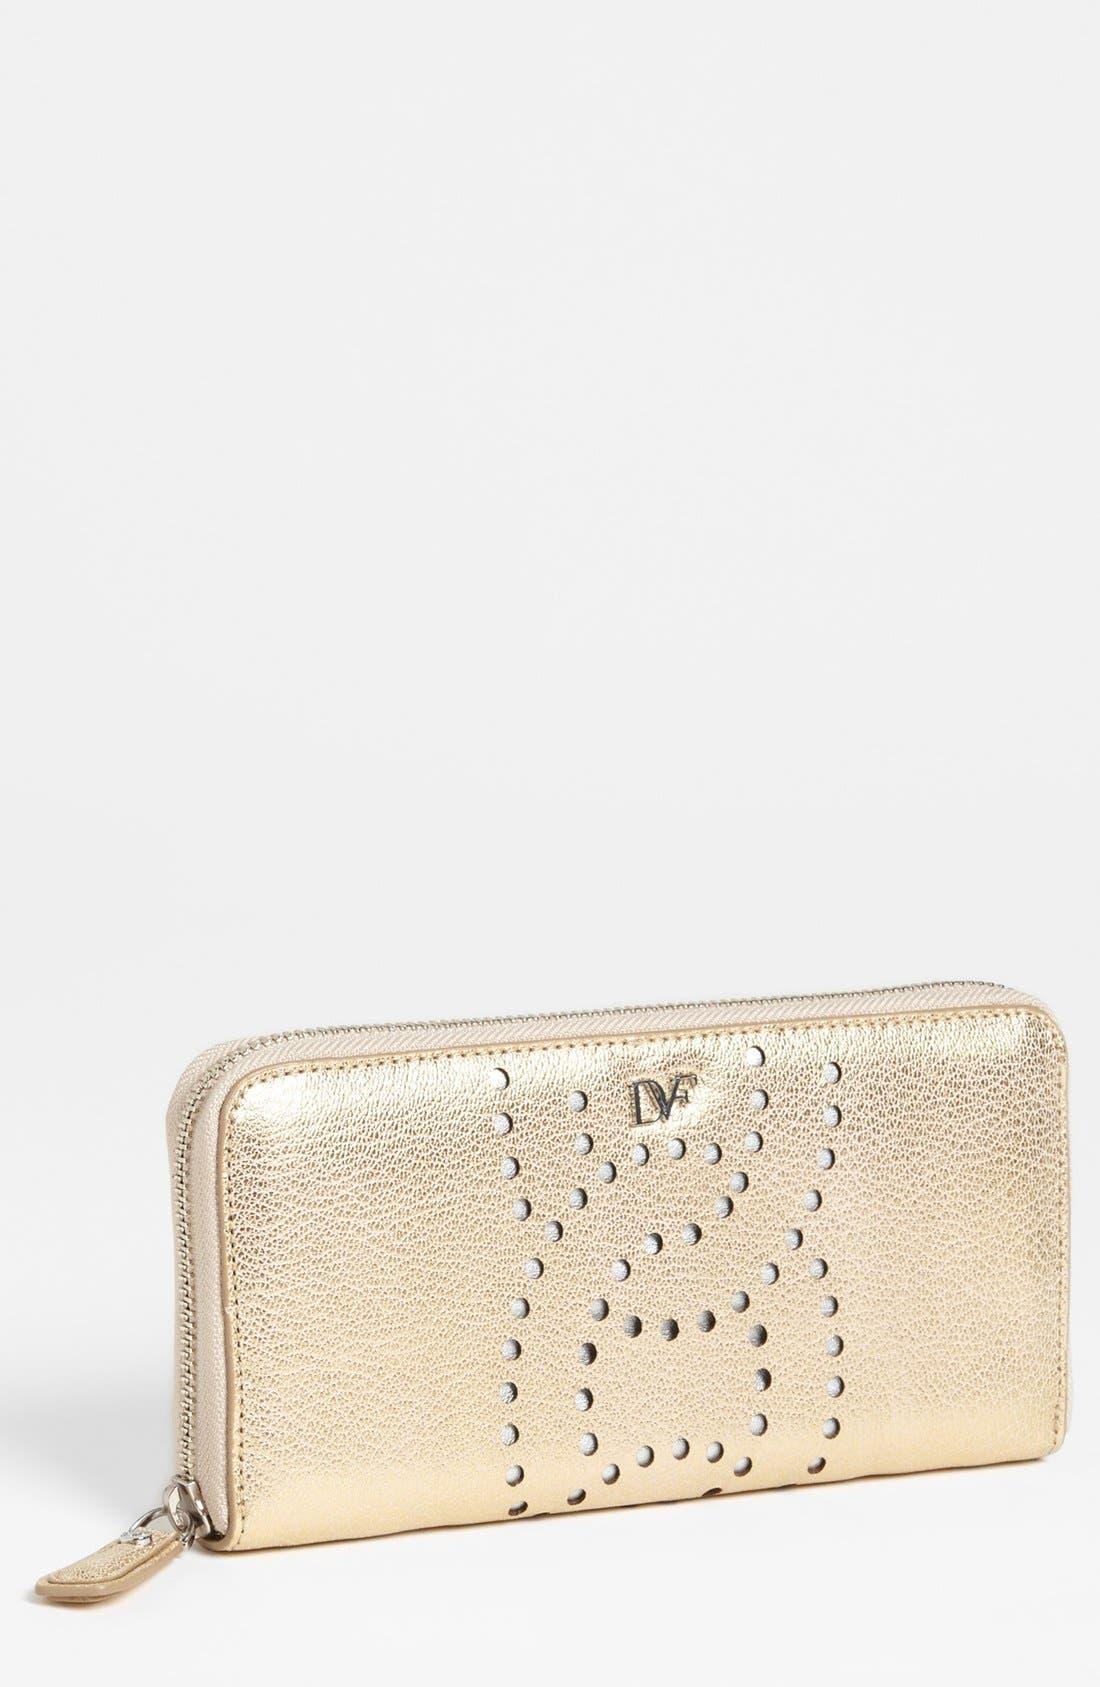 Alternate Image 1 Selected - Diane von Furstenberg 'Sutra' Leather Wallet